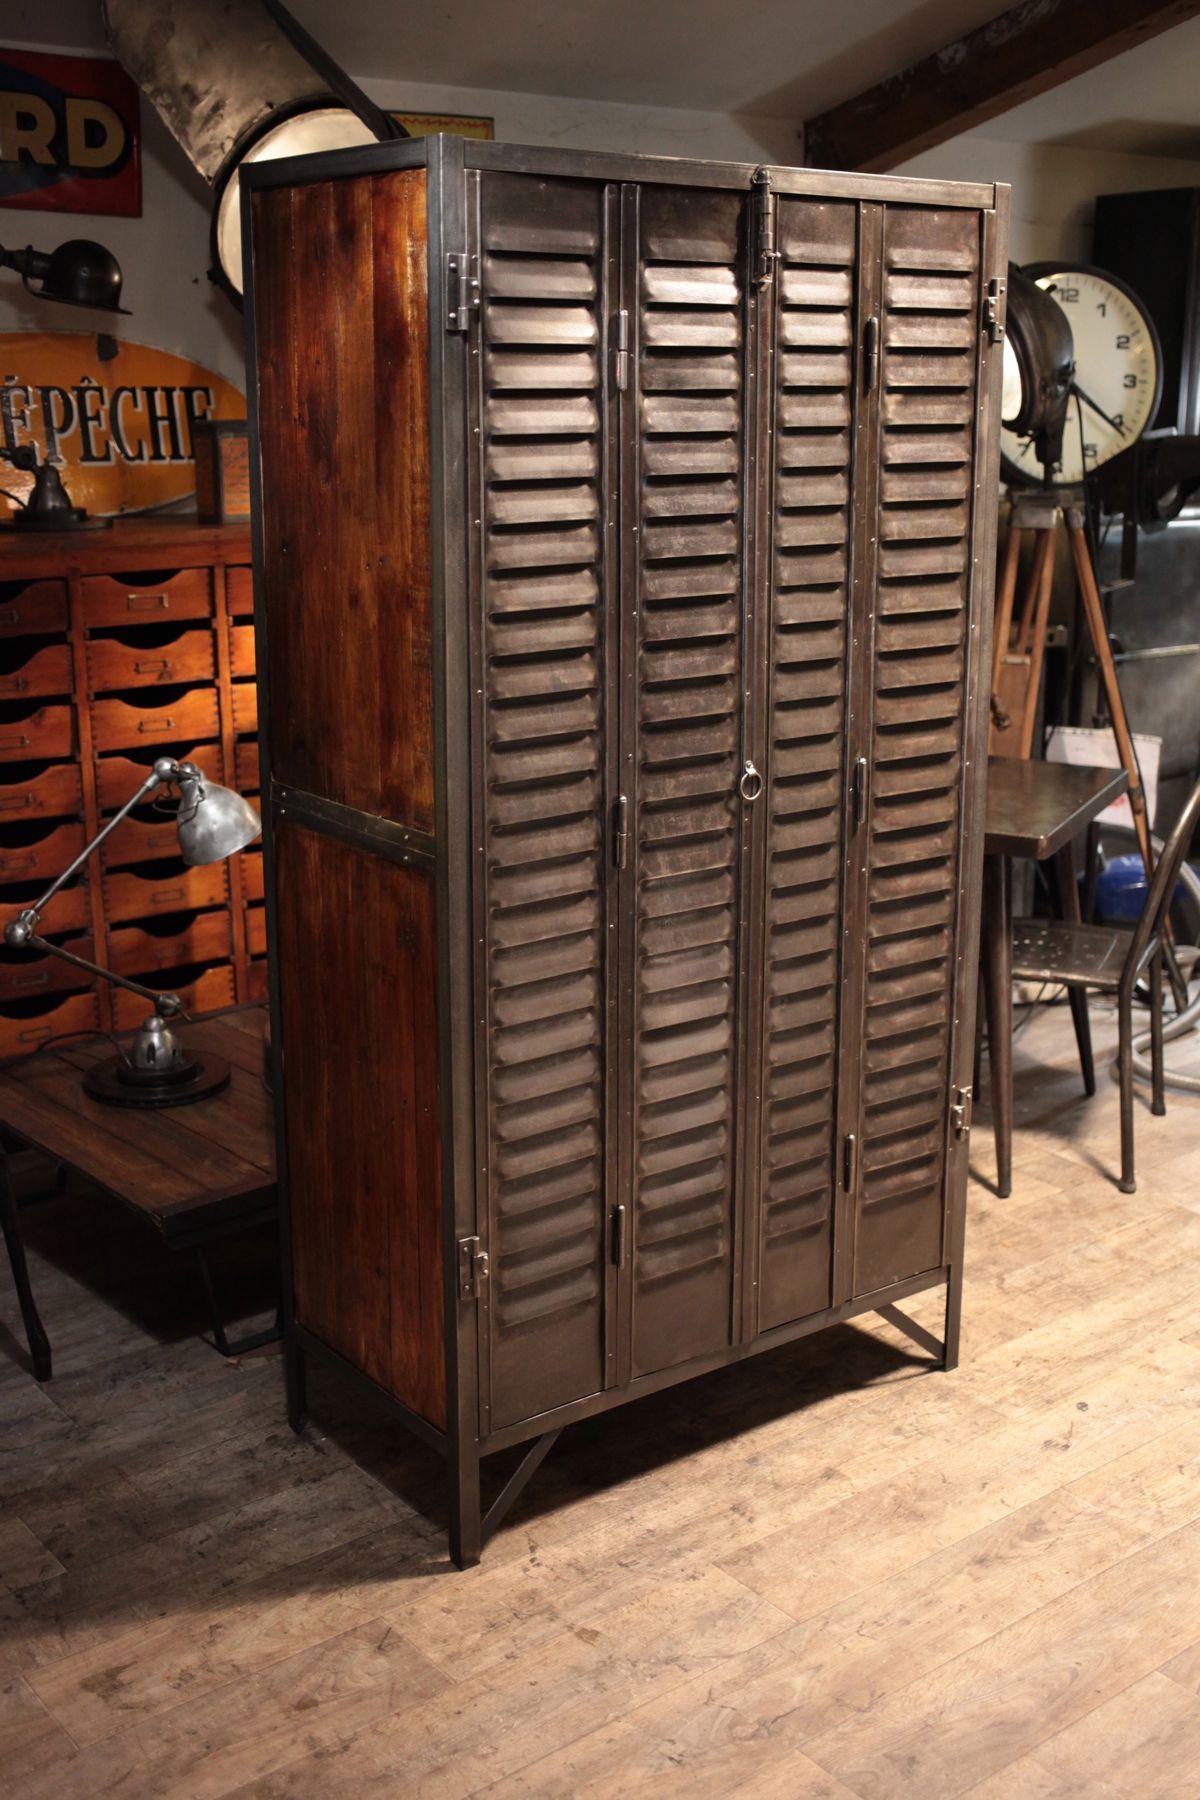 Mobilier Industriel Vintage Industrial @ Renaud Jaylac via AntiquitesBrocantes